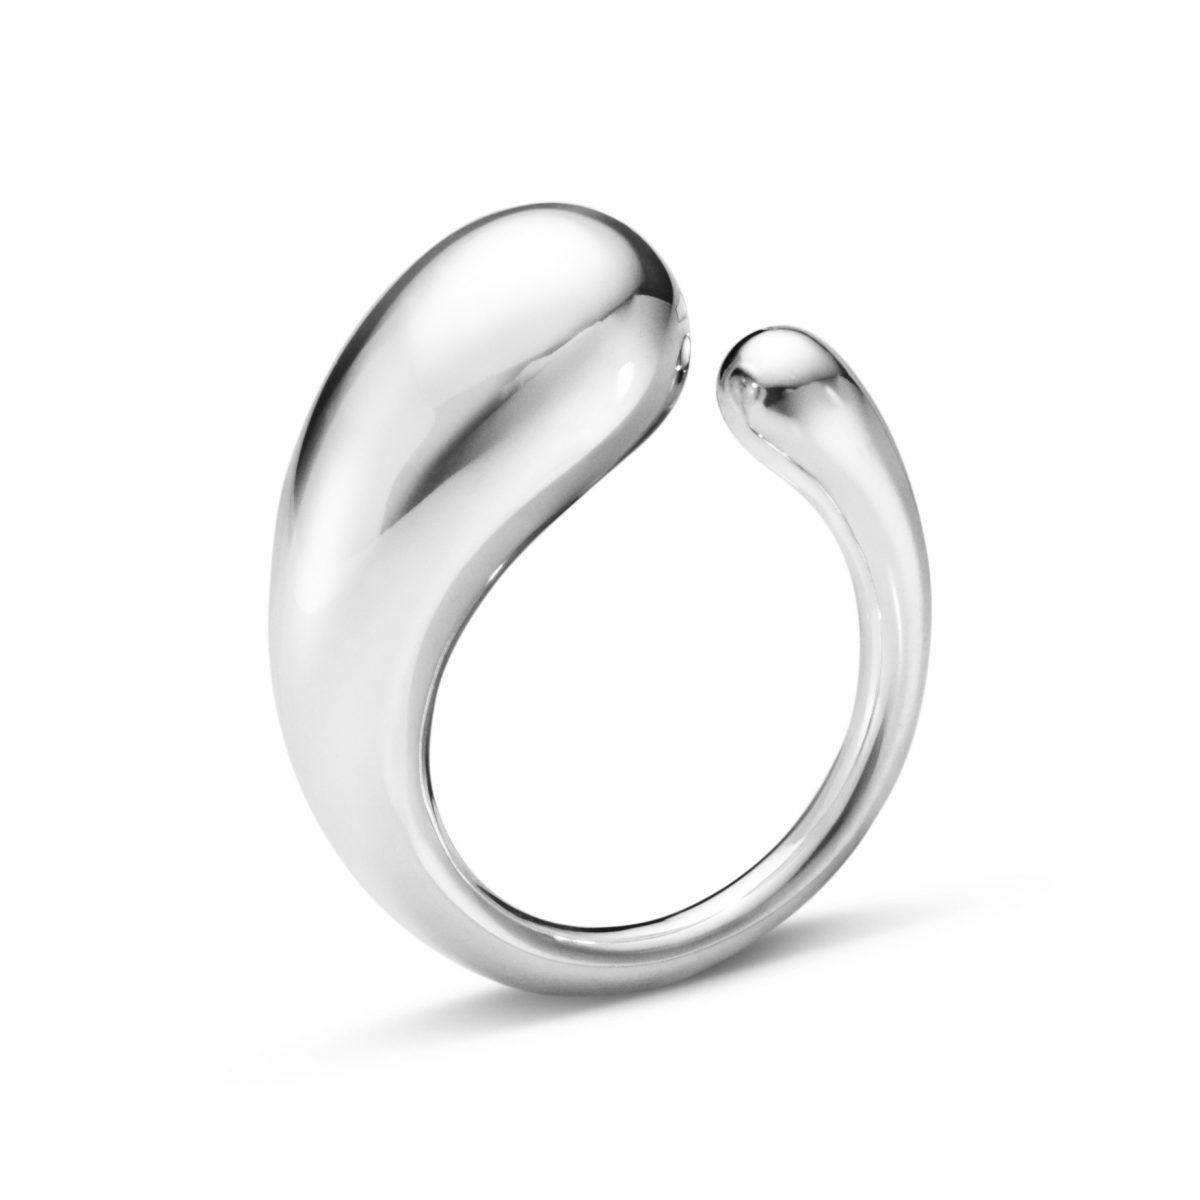 product/1/0/10015120_mercy_large_ring_634b_silver_jpg_max_3000x3000_466215.jpg